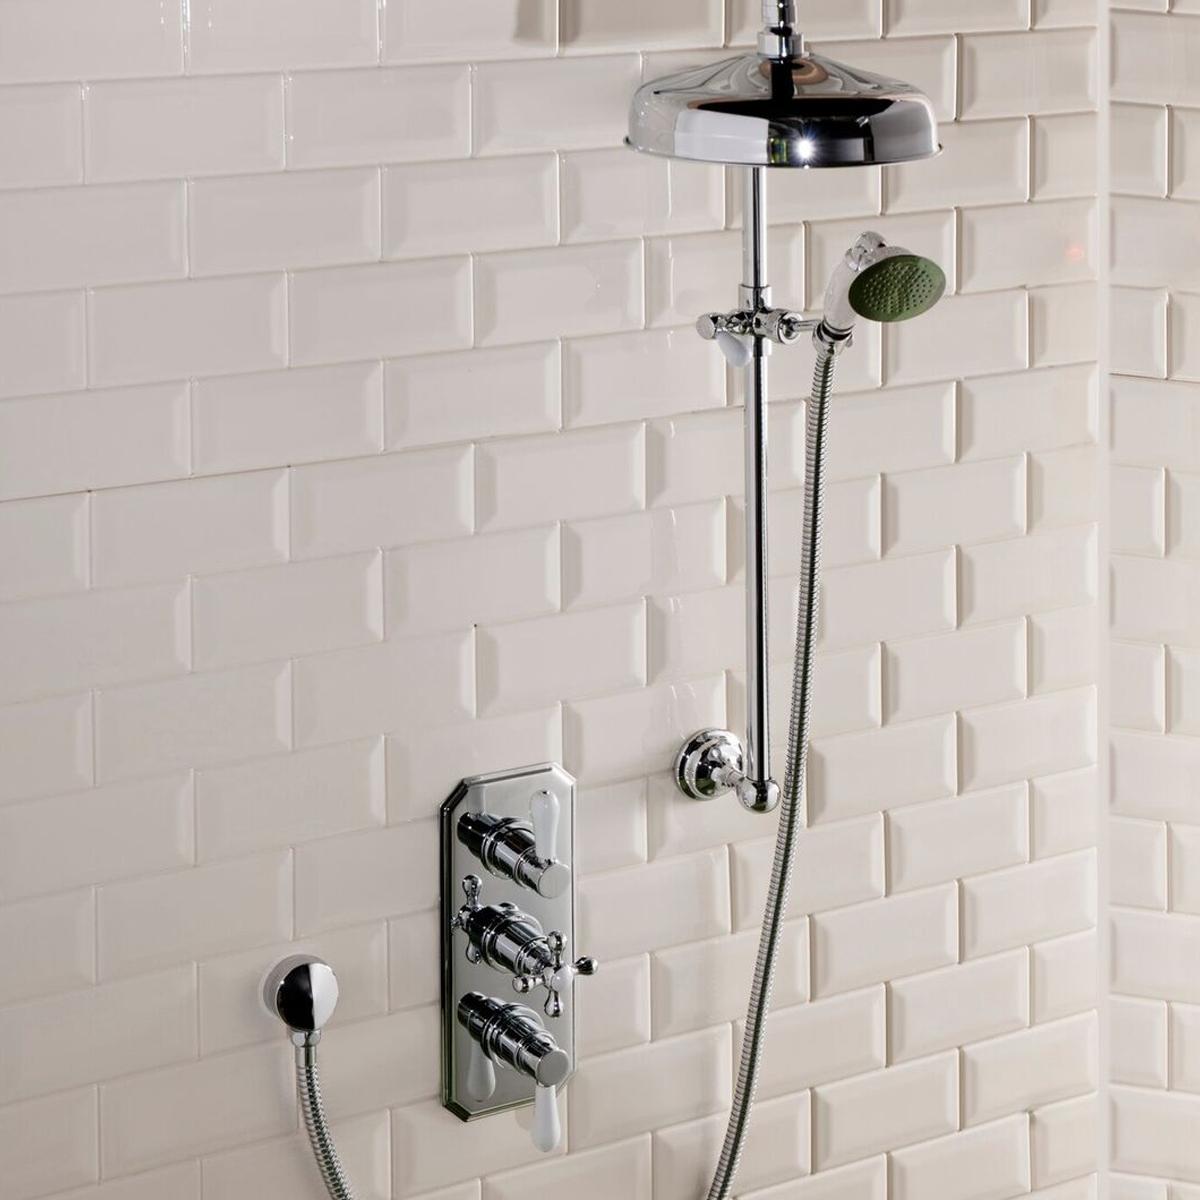 Cali Tudor Traditional Concealed Shower Valve - Triple Handle - Chrome-3